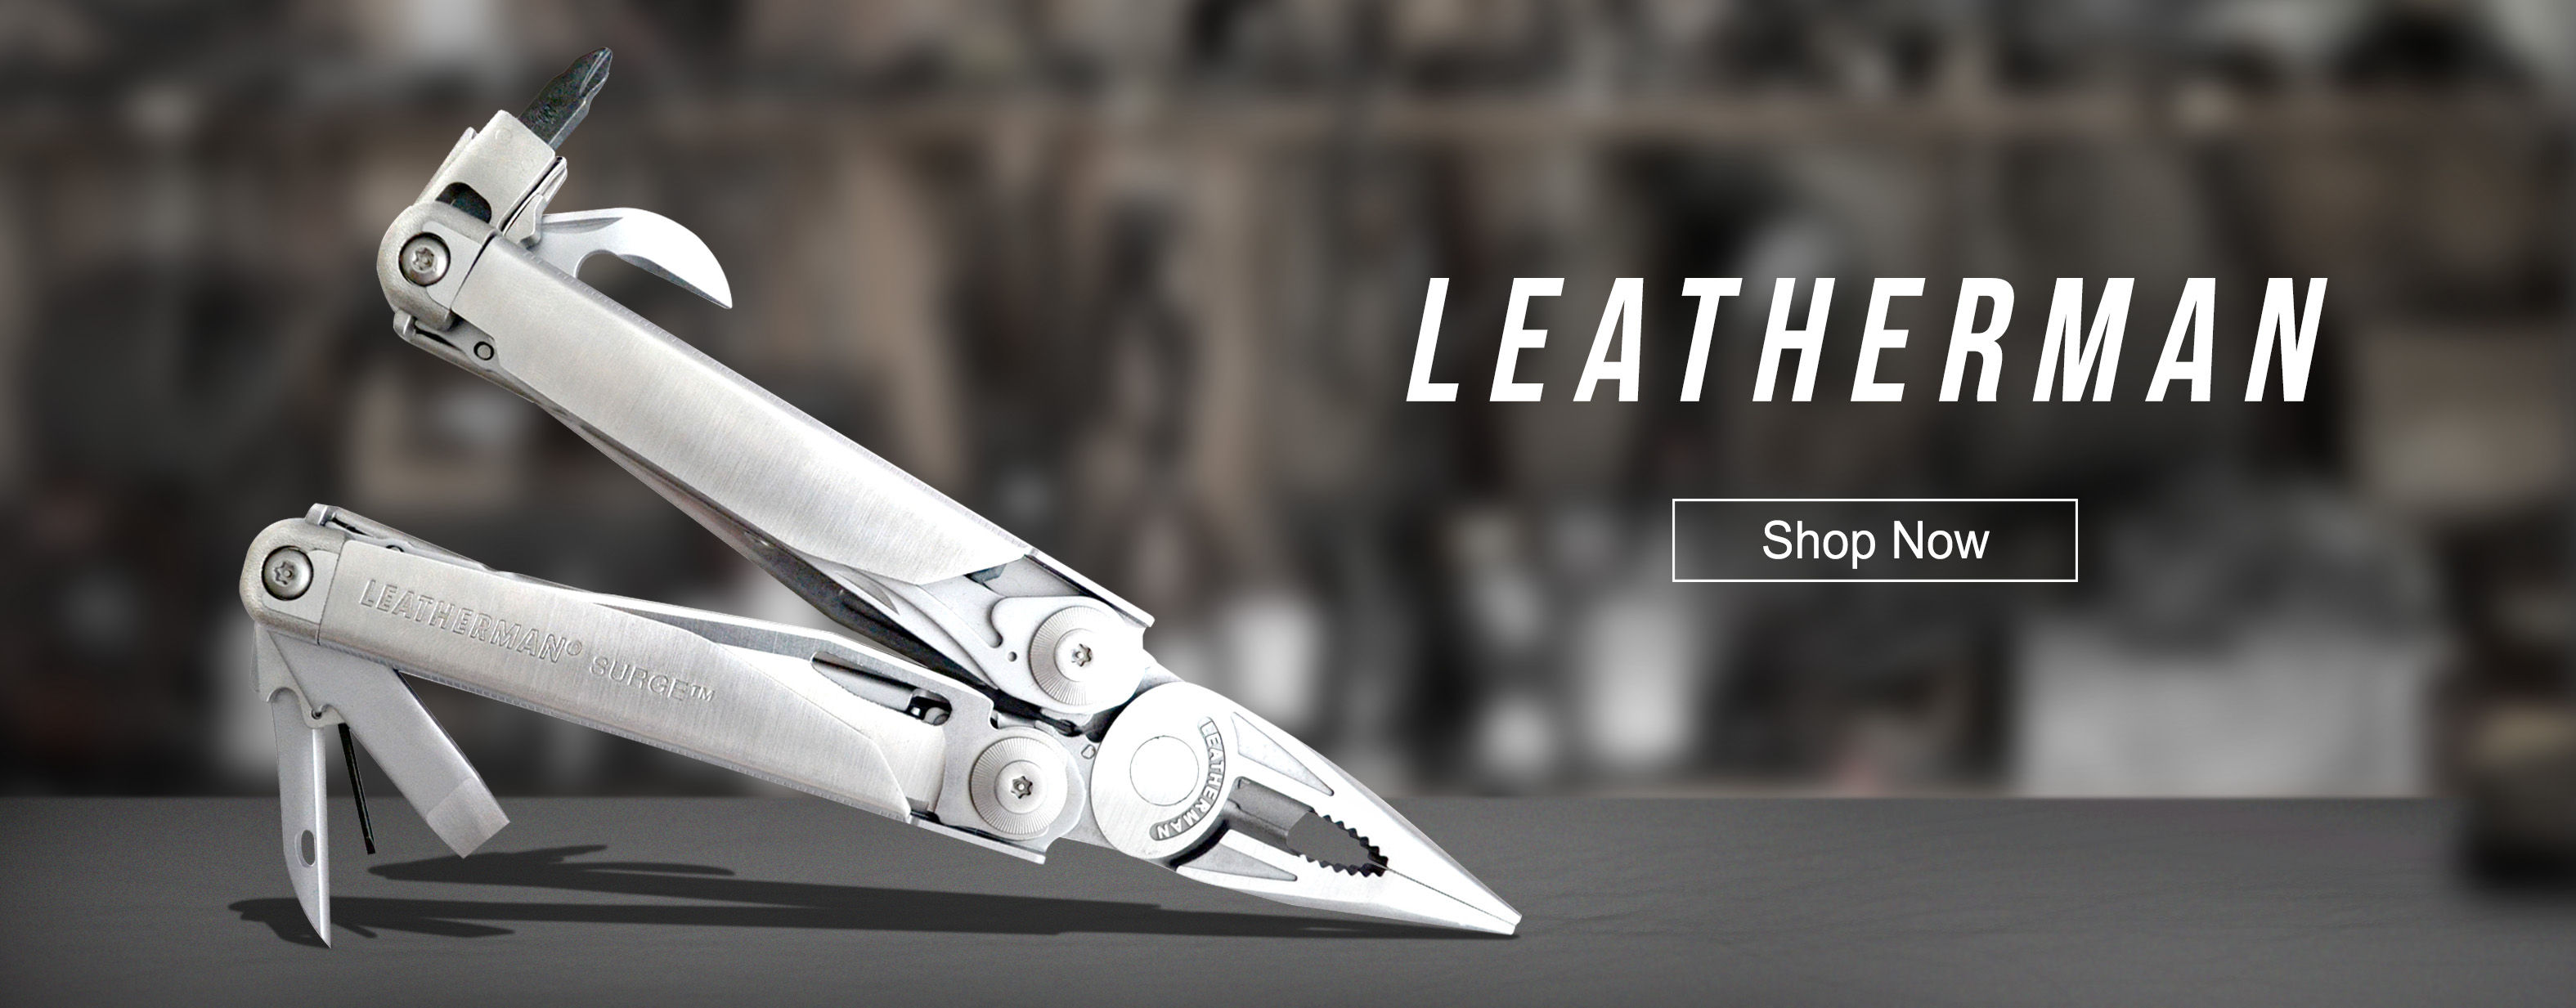 leatherman-756-2.jpg